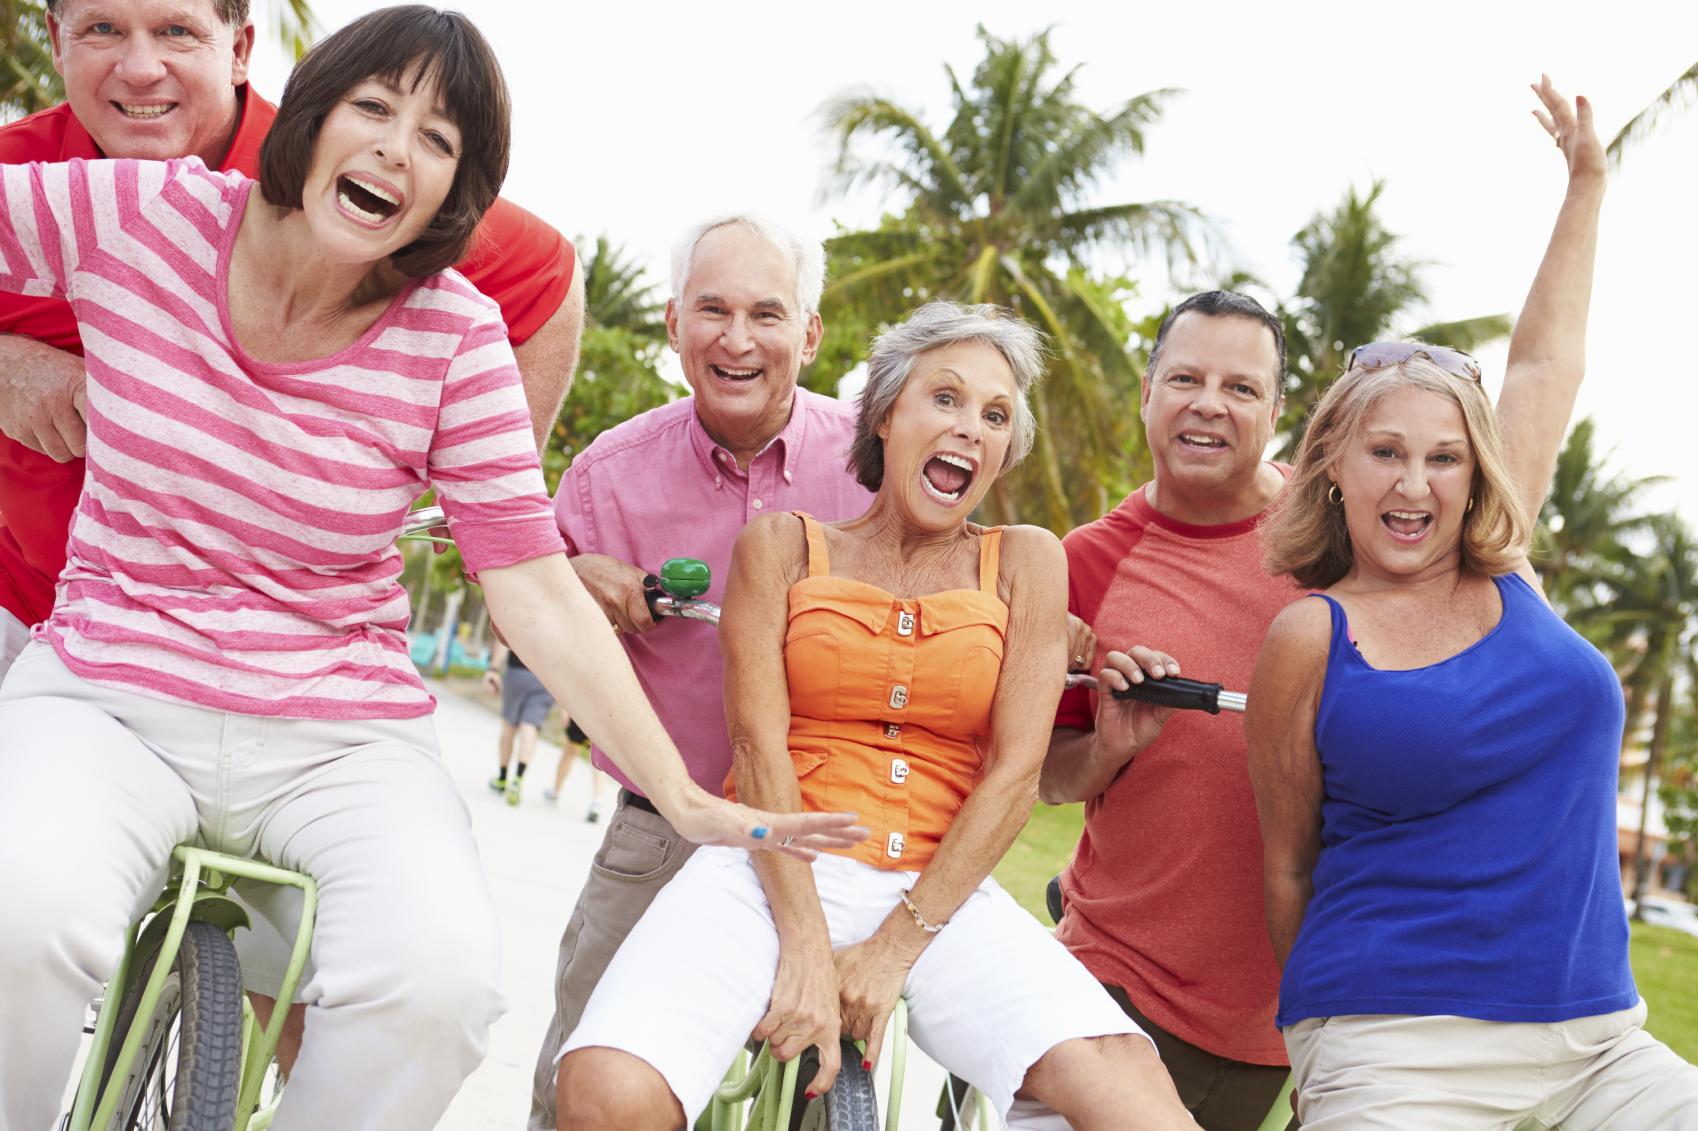 Most Popular Senior Dating Online Services No Membership